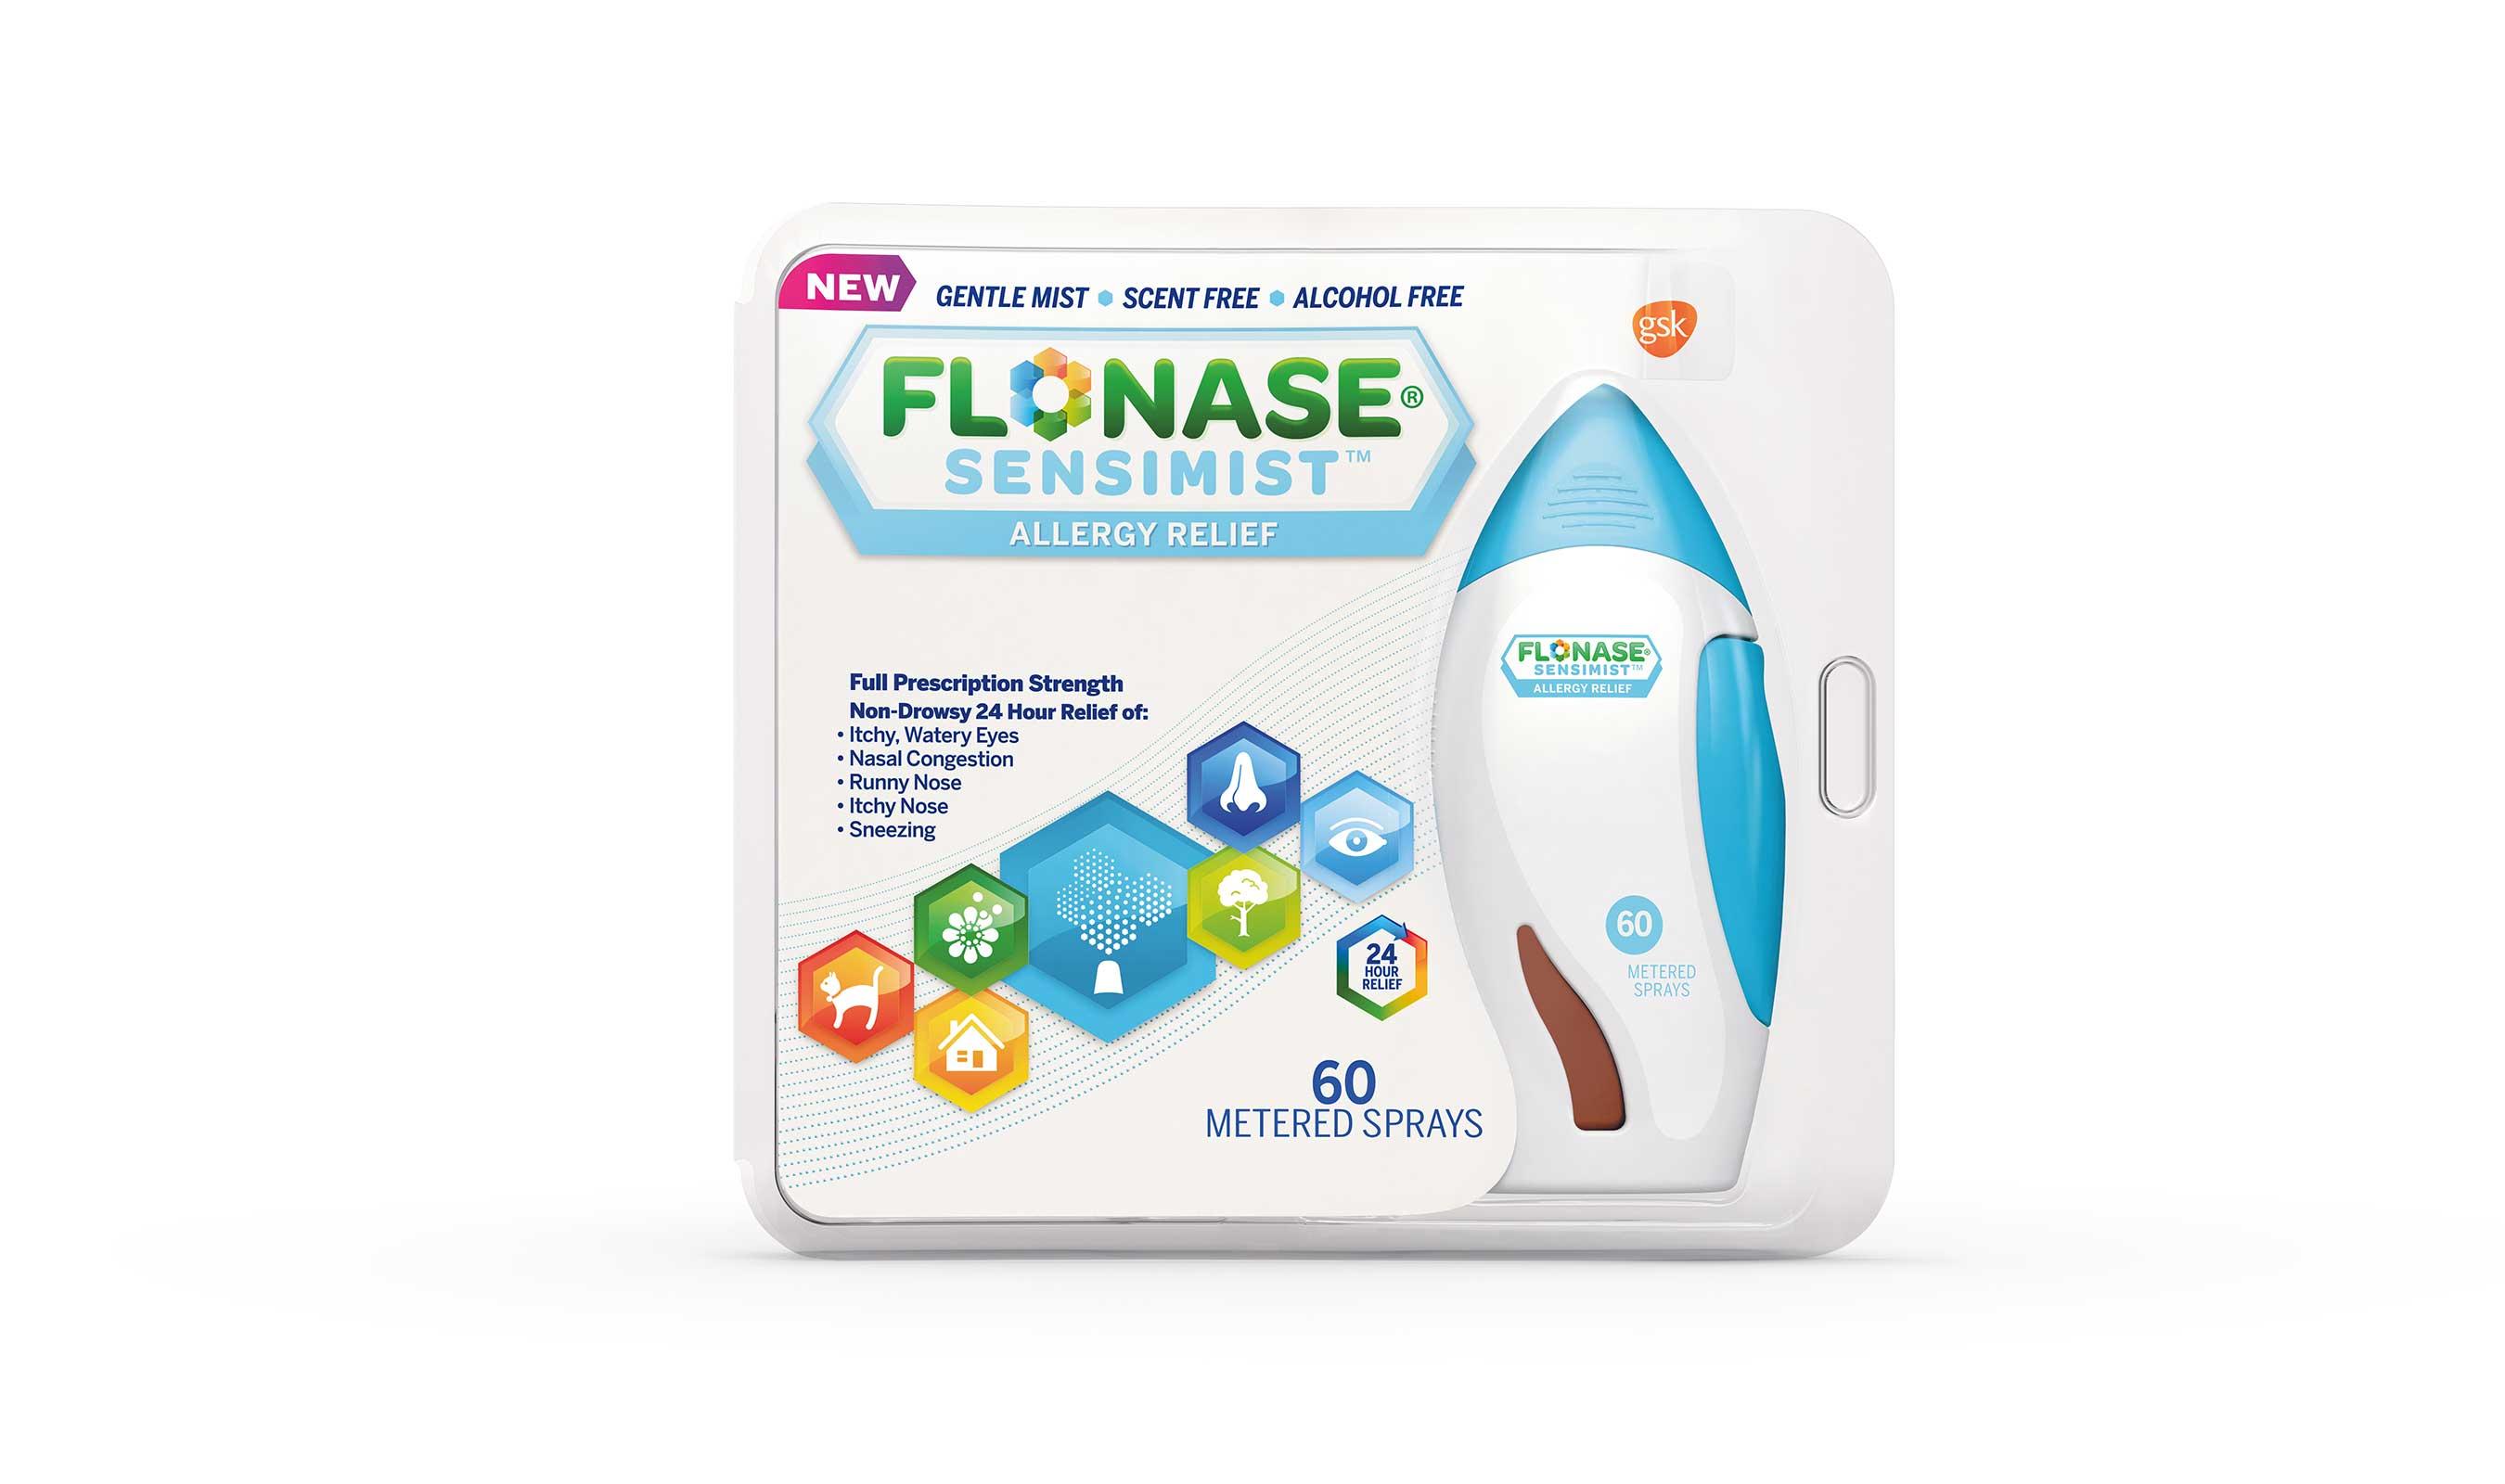 FLONASE® Sensimist™ Allergy Relief